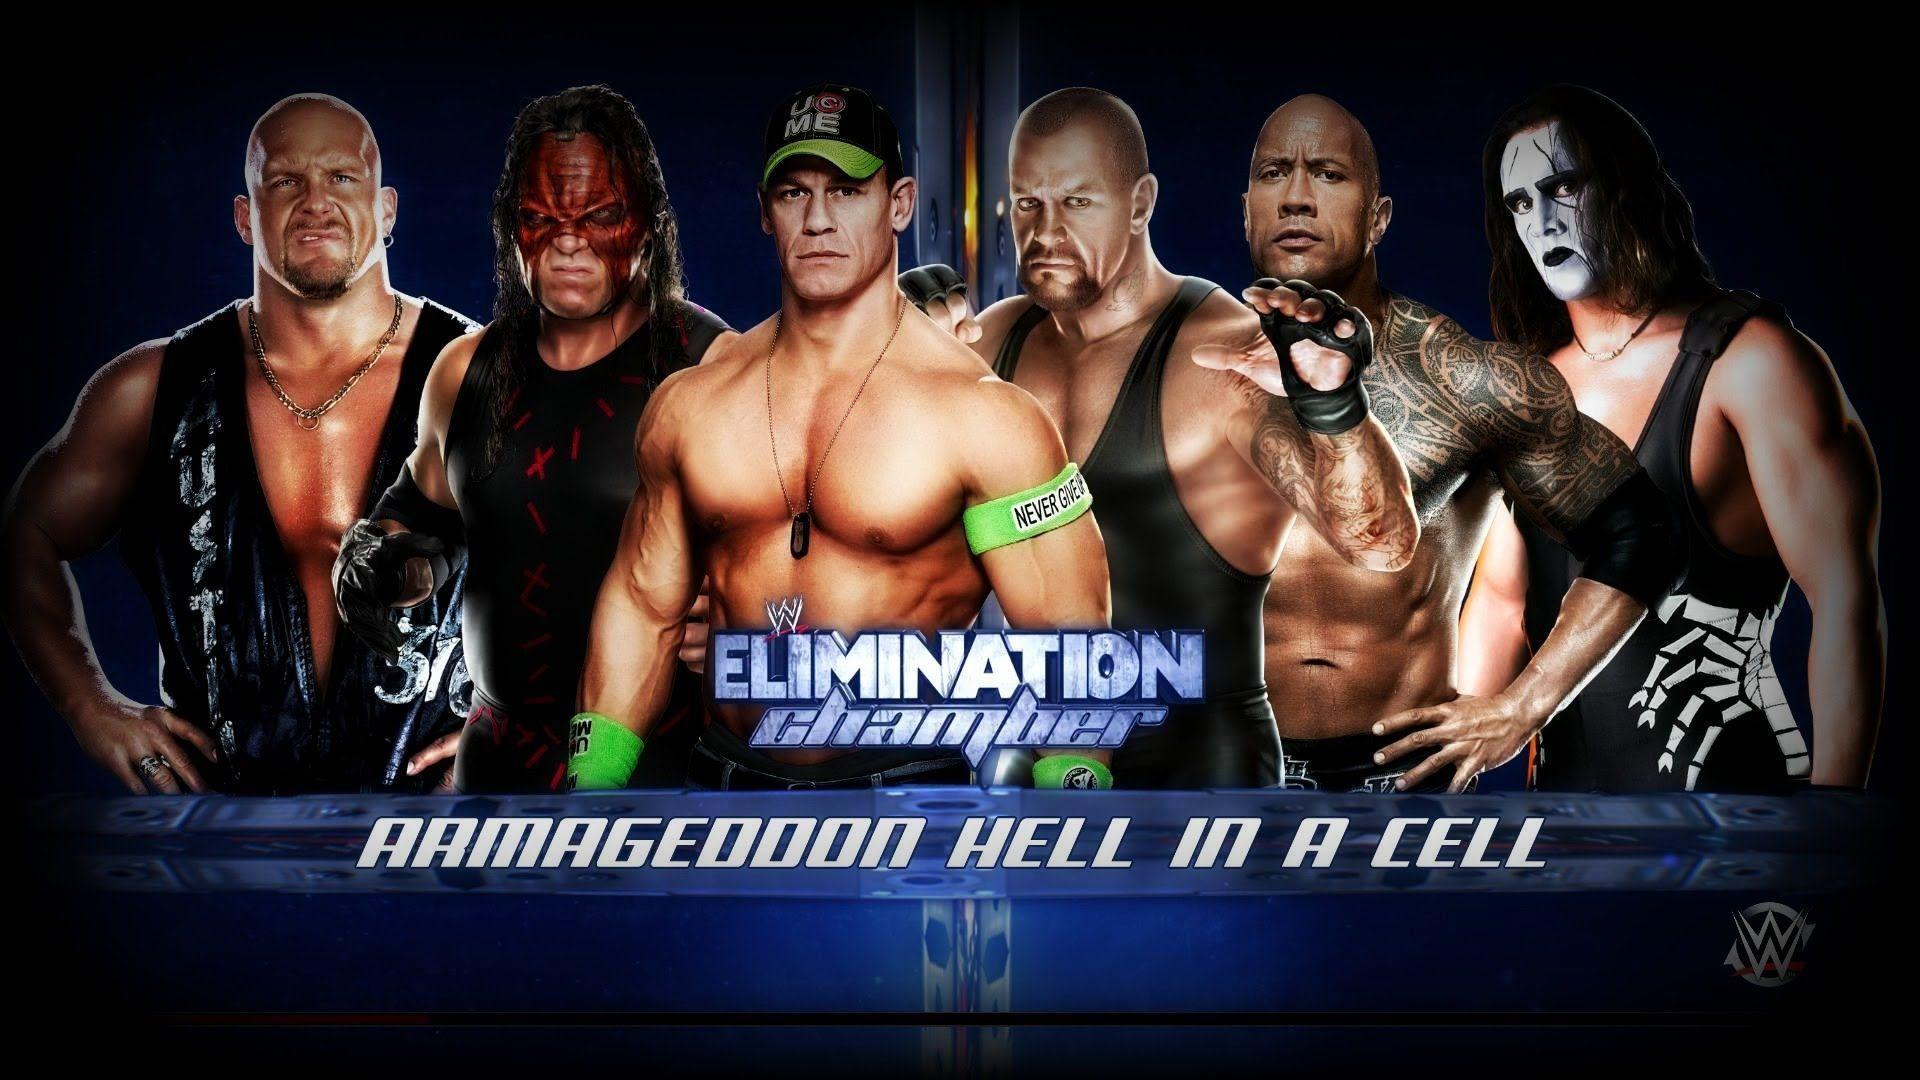 John Cena Vs Undertaker Wallpapers - Wallpaper Cave